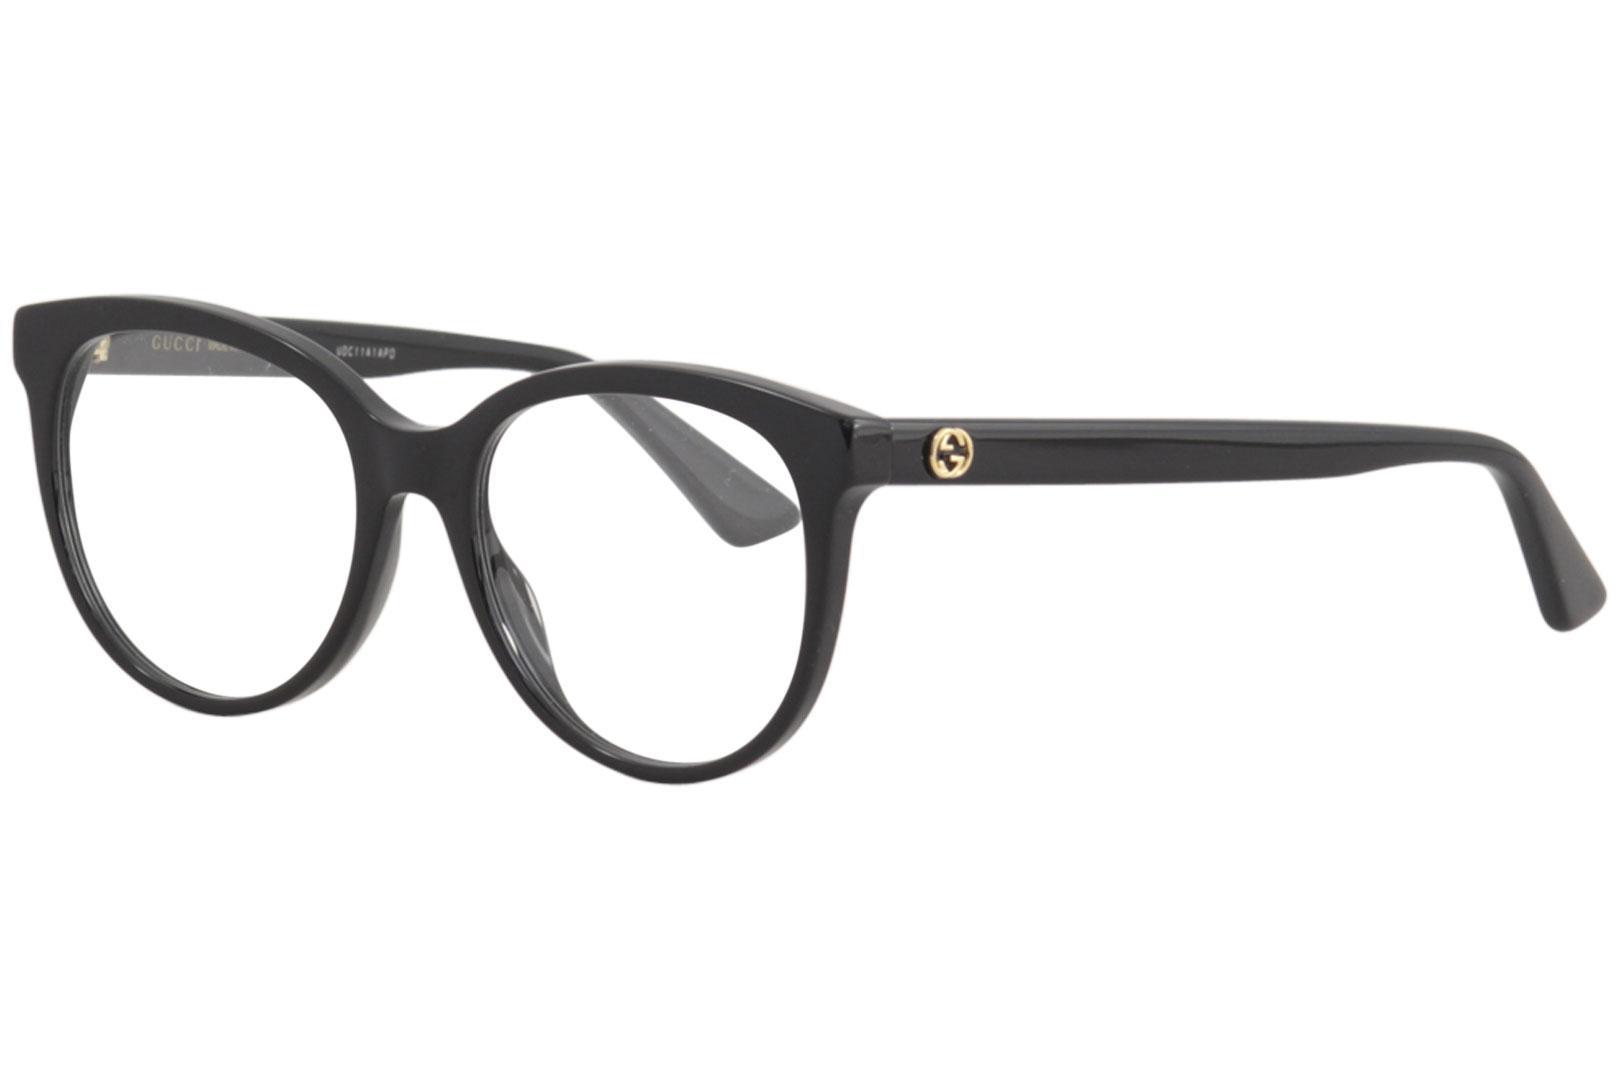 5a12e70a5506 Gucci Women's Eyeglasses Urban GG0329O GG/0329O Full Rim Optical Frame